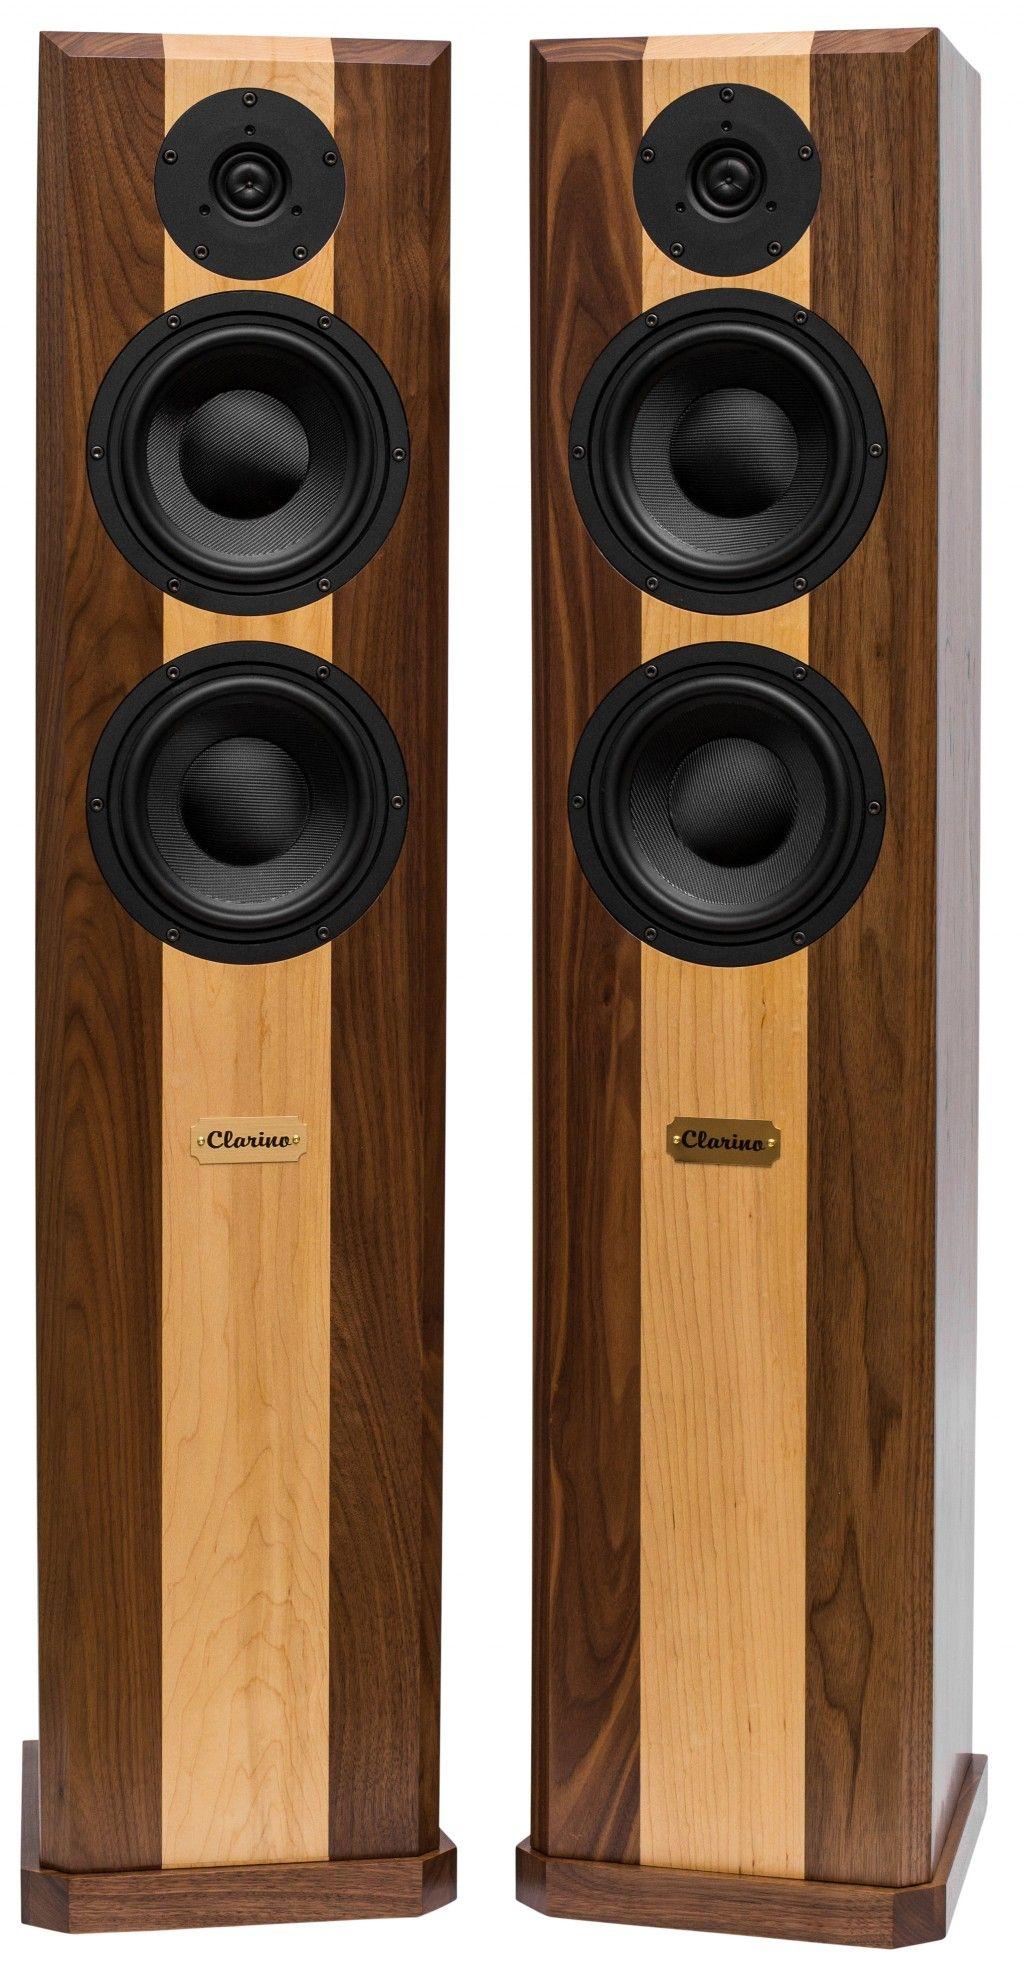 Clarino   Speaker projects, Diy speakers, Speaker box design